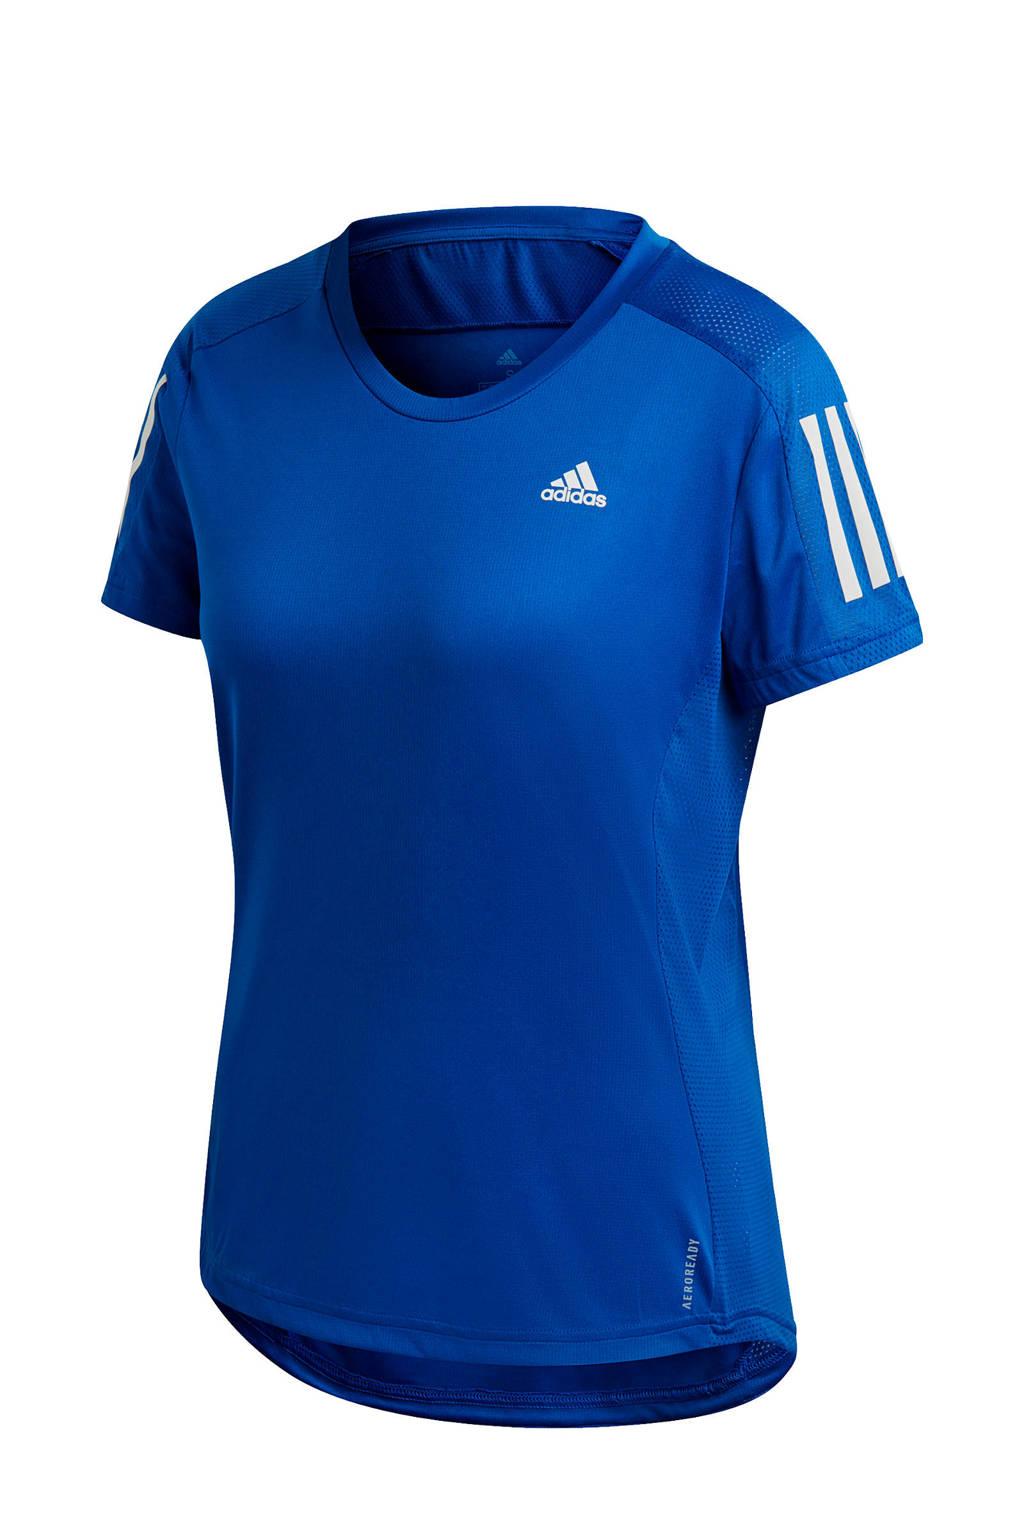 adidas Performance hardloopshirt blauw, Blauw, Dames